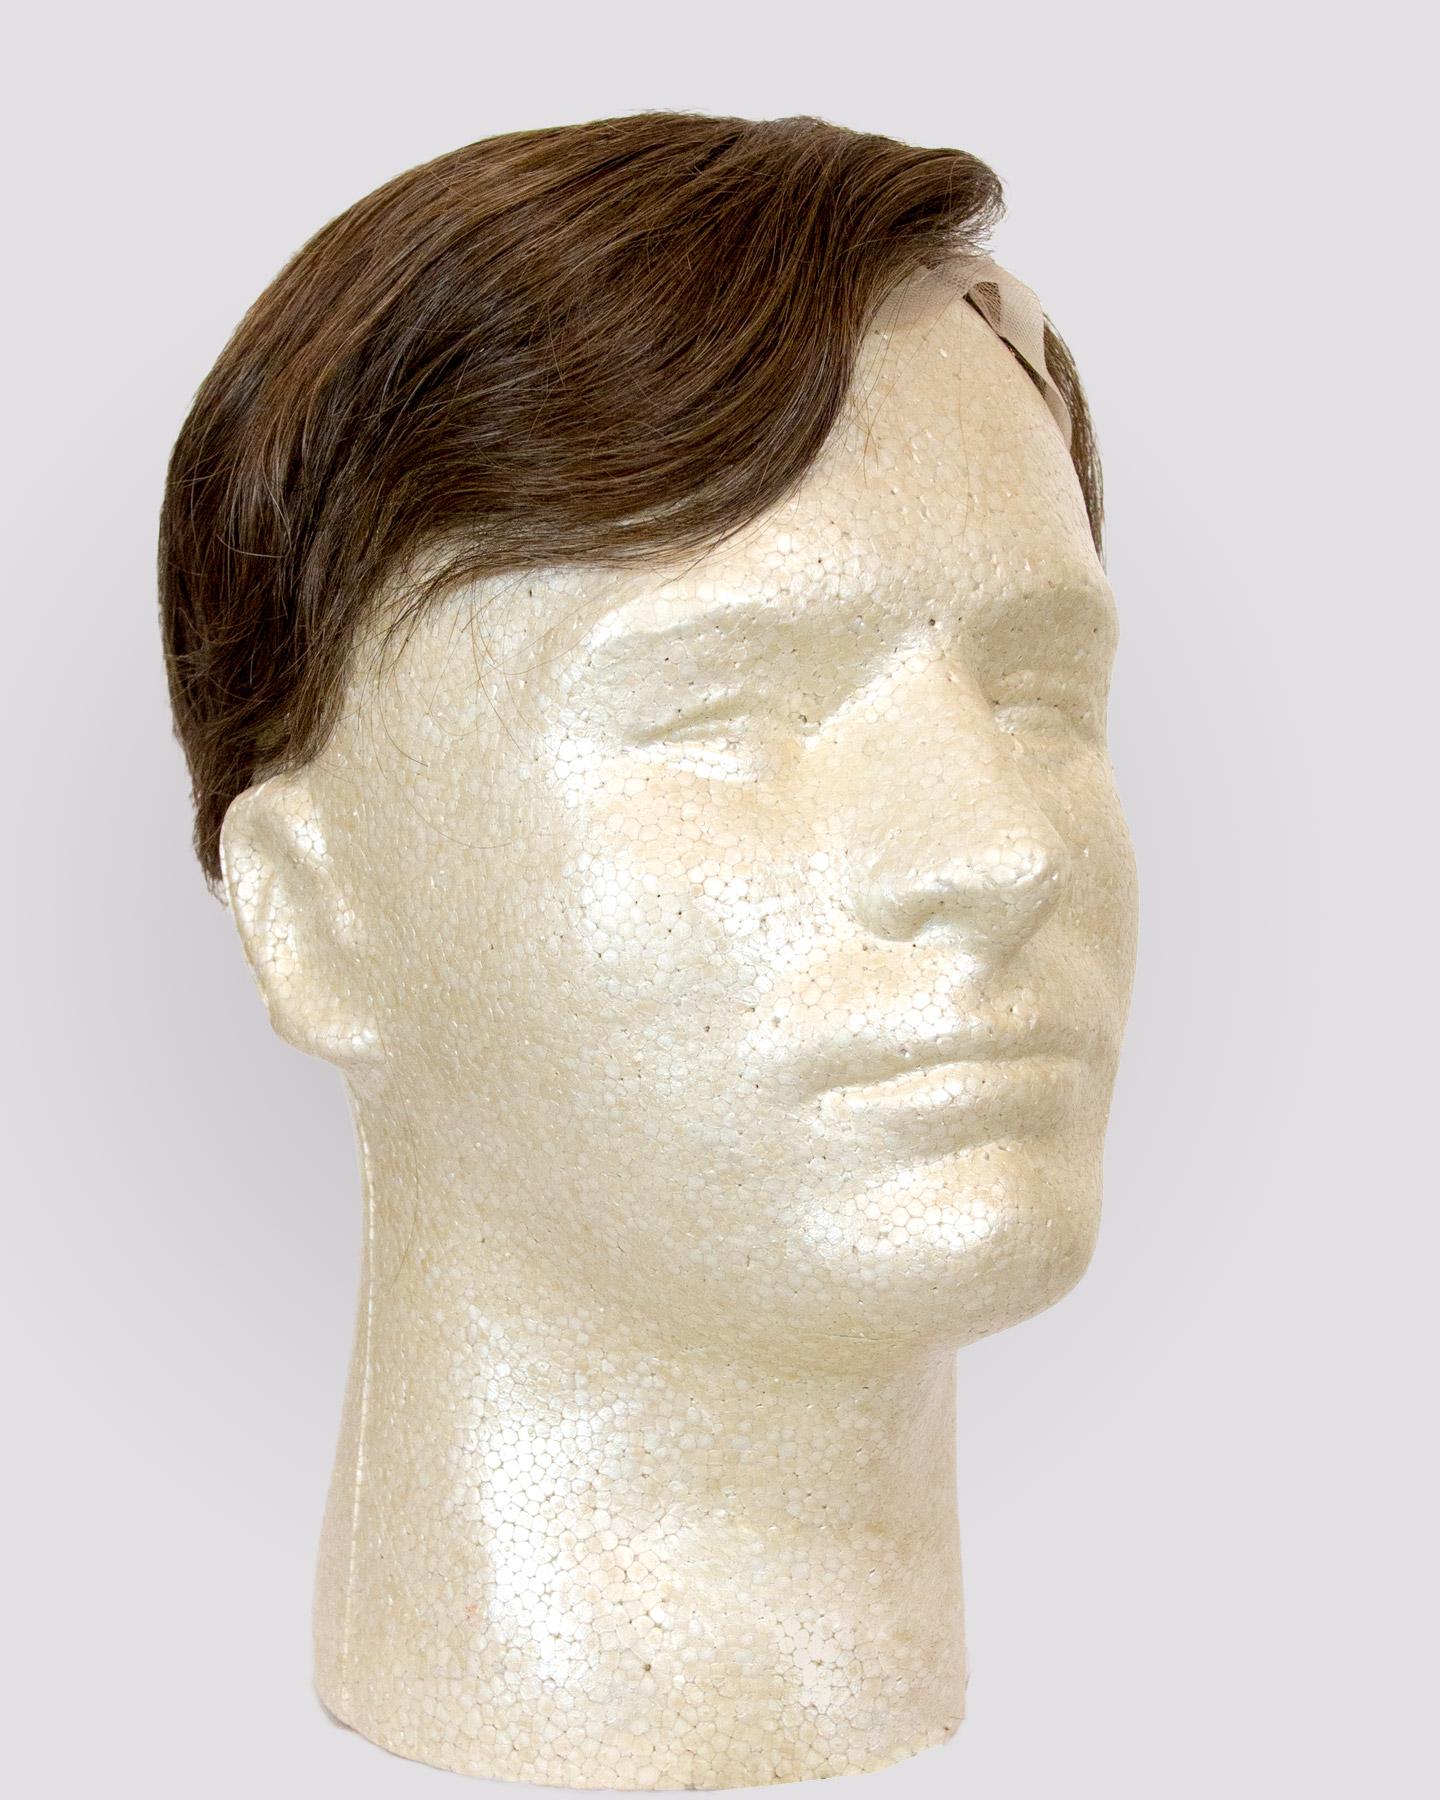 6 Inch Mens Toupee Original John Blake